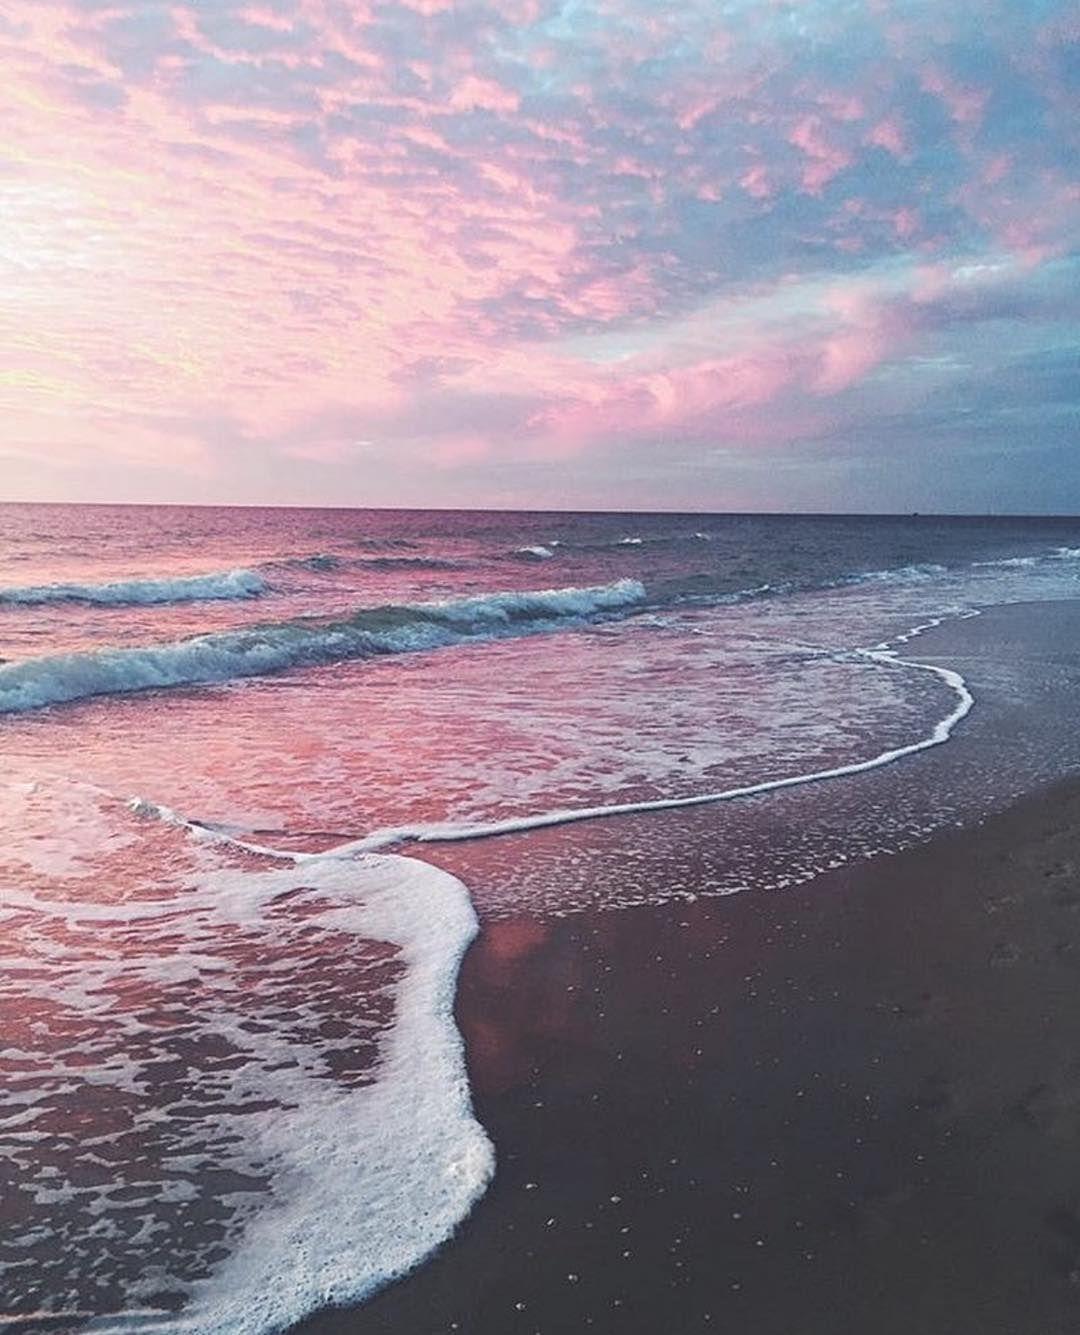 Pink Beach Aesthetic Wallpaper